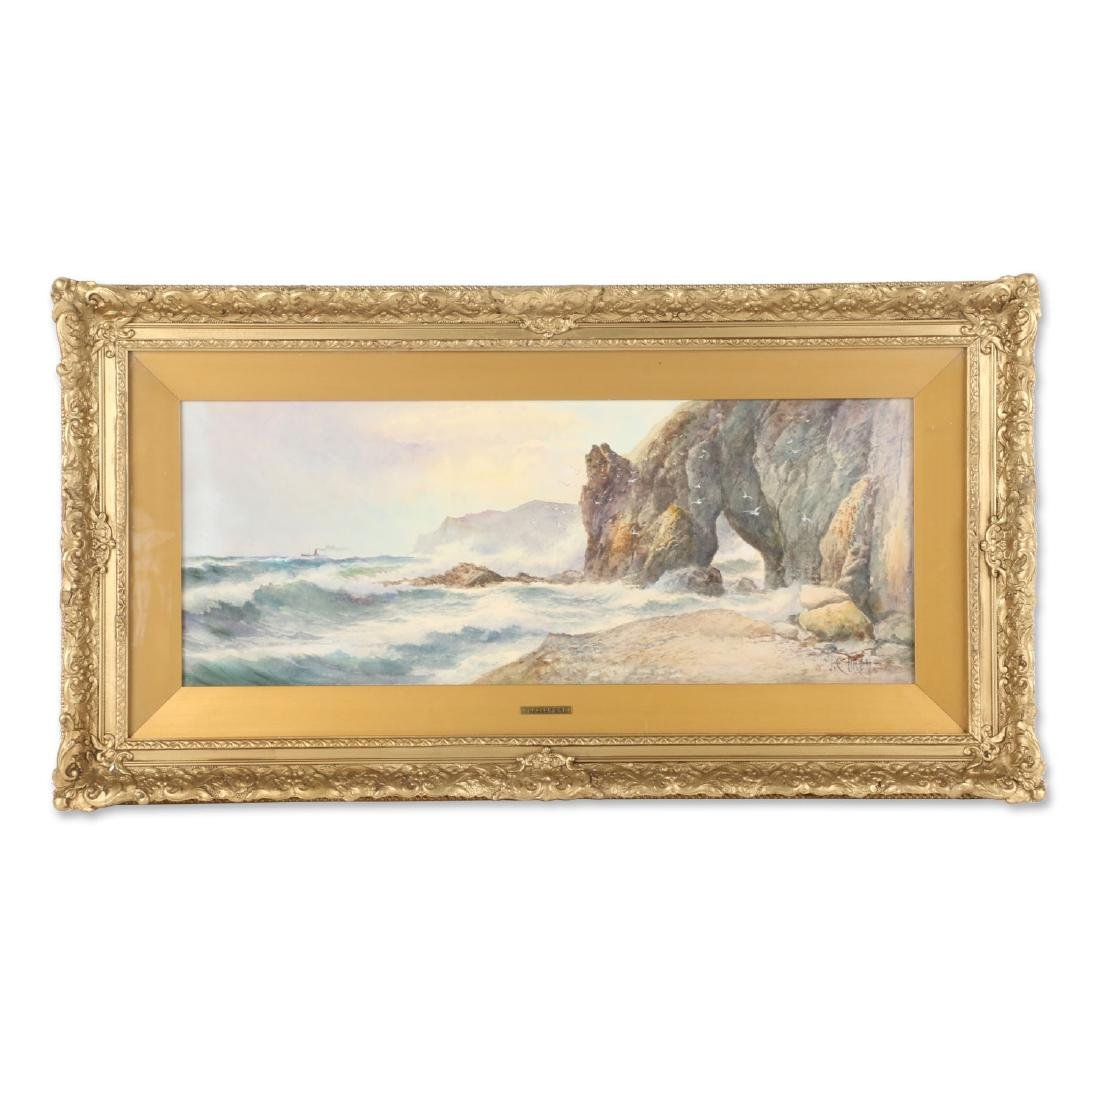 J.C. Uren Watercolour Painting